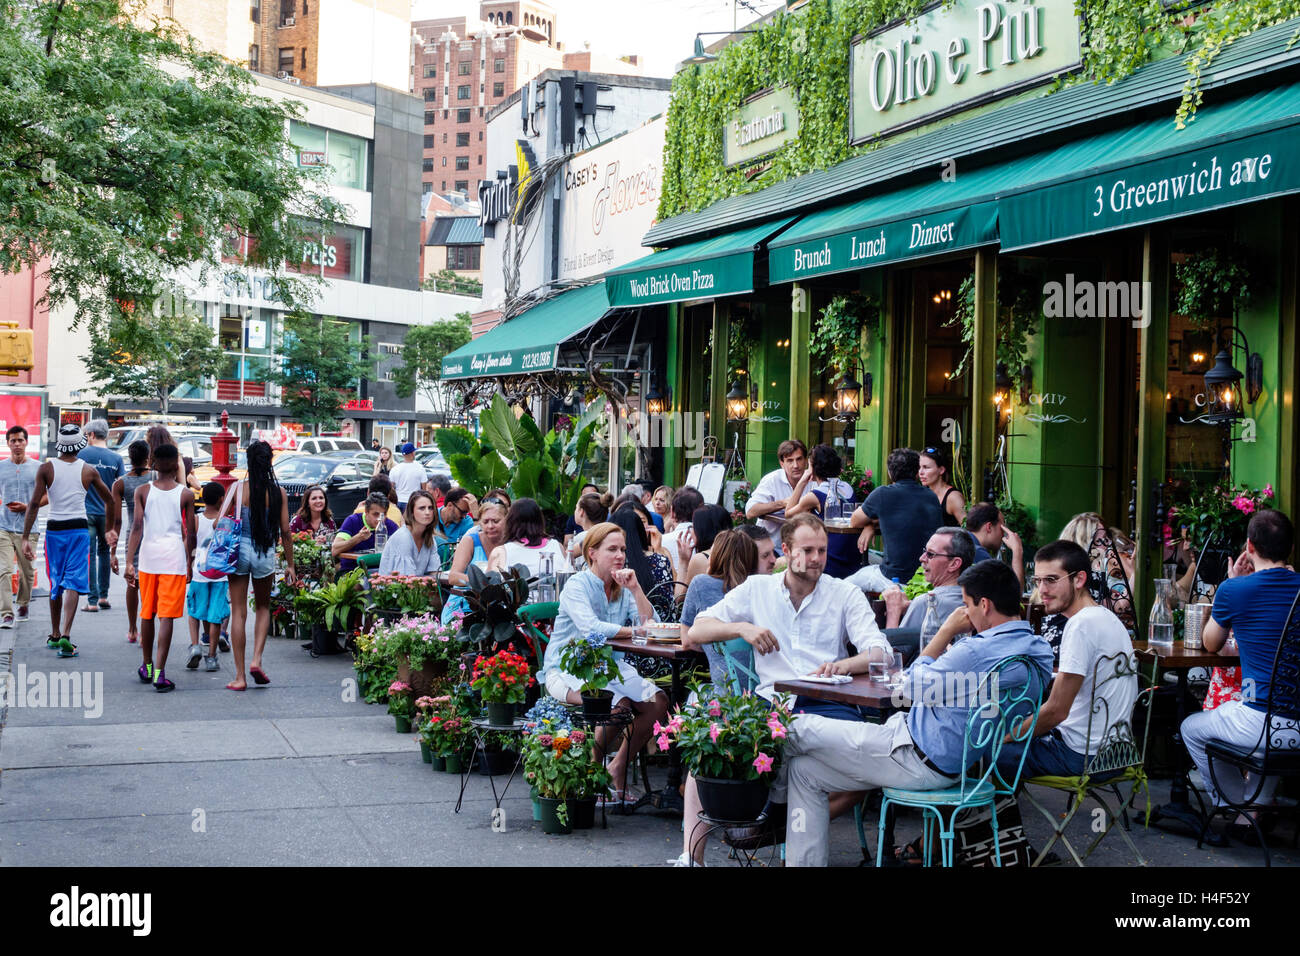 Manhattan New York City NYC NY West Village Olio E Piu Italian Restaurant  Trattoria Sidewalk Alfresco Dining Brunch Man Woman Couple Tables Outdoor Se